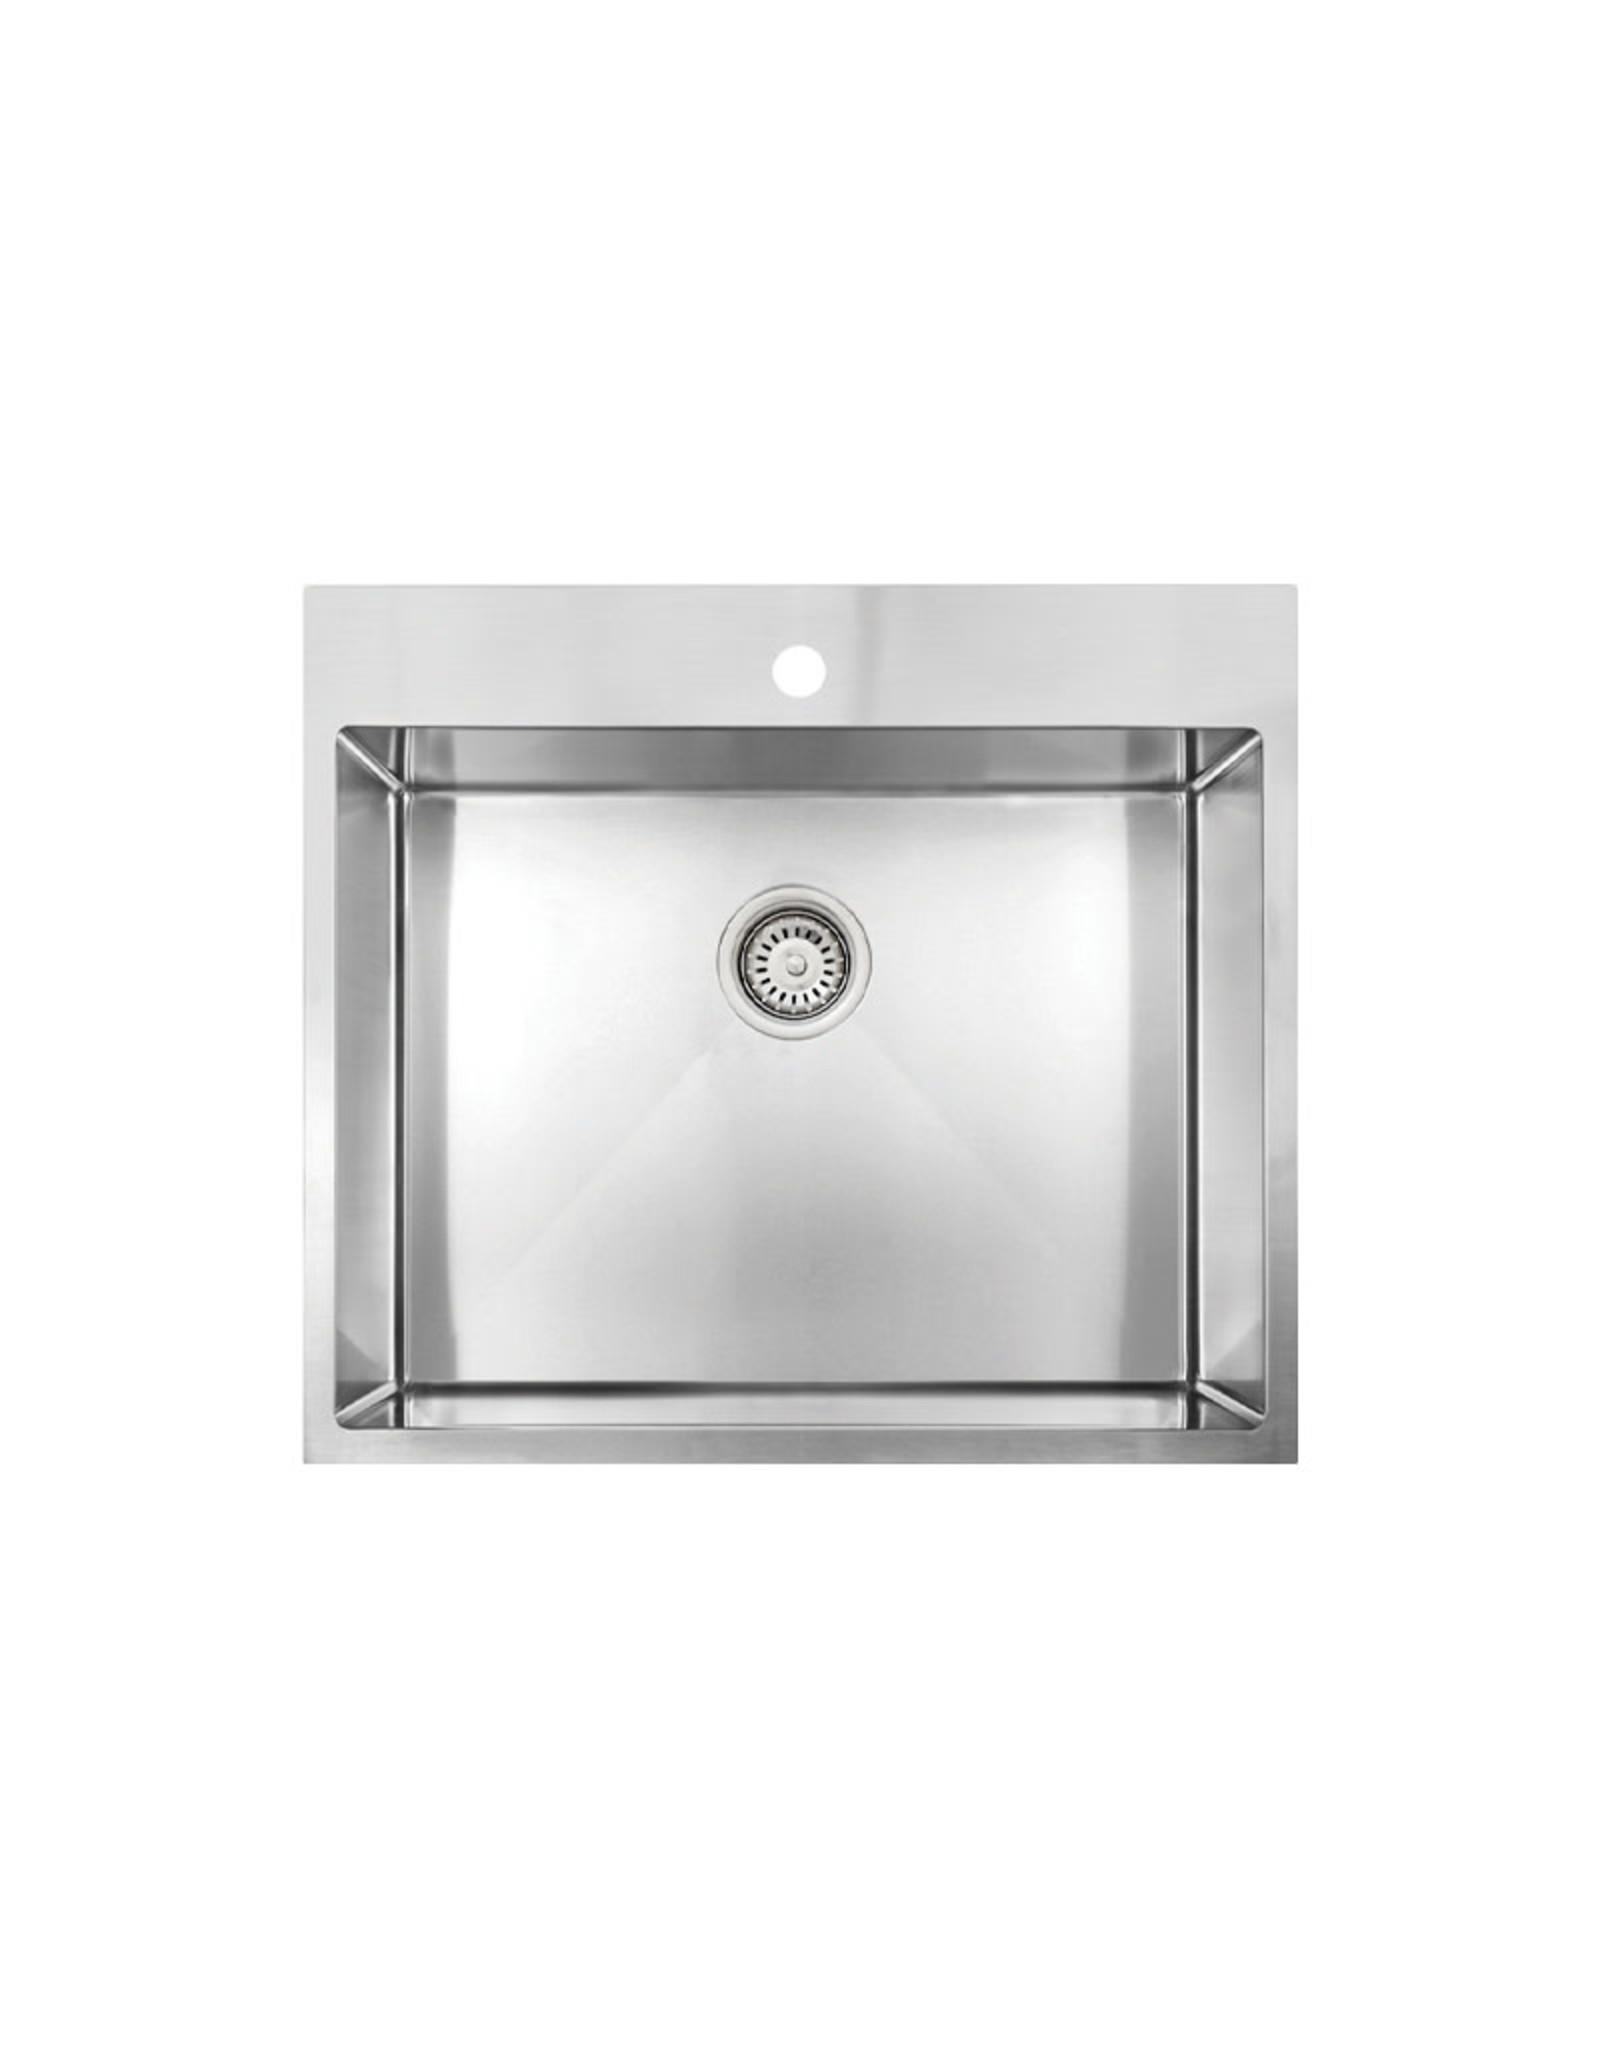 "Vogt Vogt Lainzer 18R Drop-In Laundry Sink 24"" x 22"" x 12"""